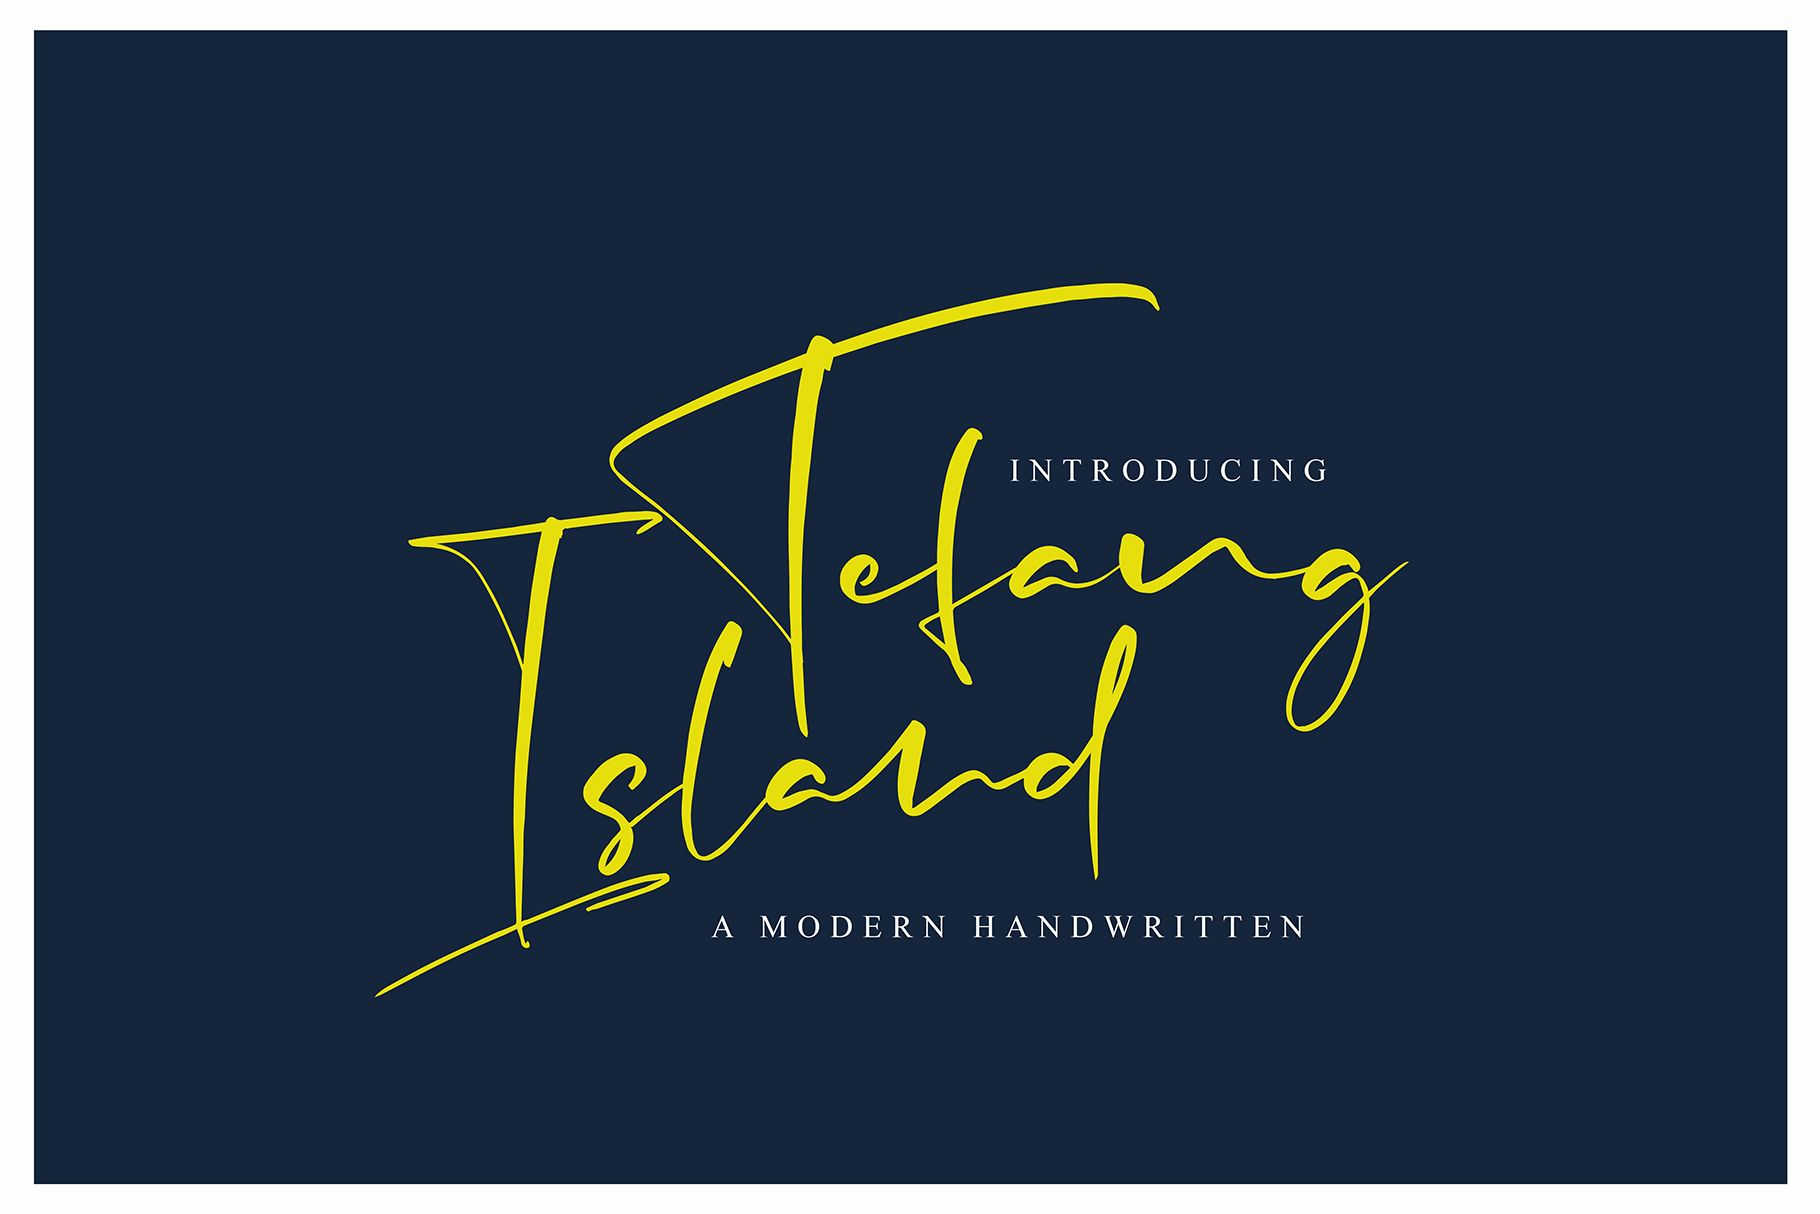 Tefang Island Pretty Fonts Handwritten Fonts Beautiful Fonts